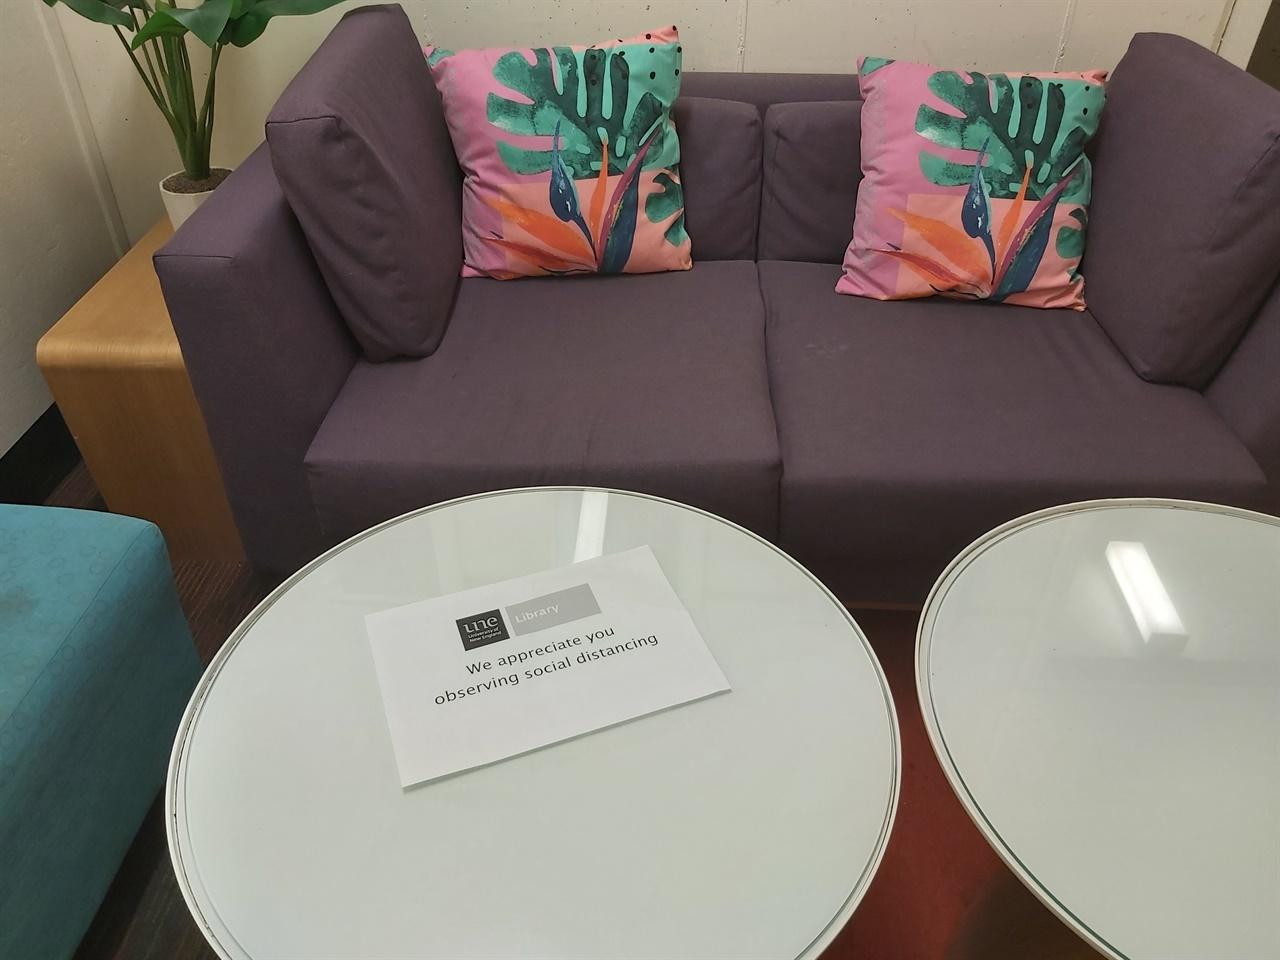 Social distancing, 도서관 공용공간 테이블 위에 붙은 경고문.